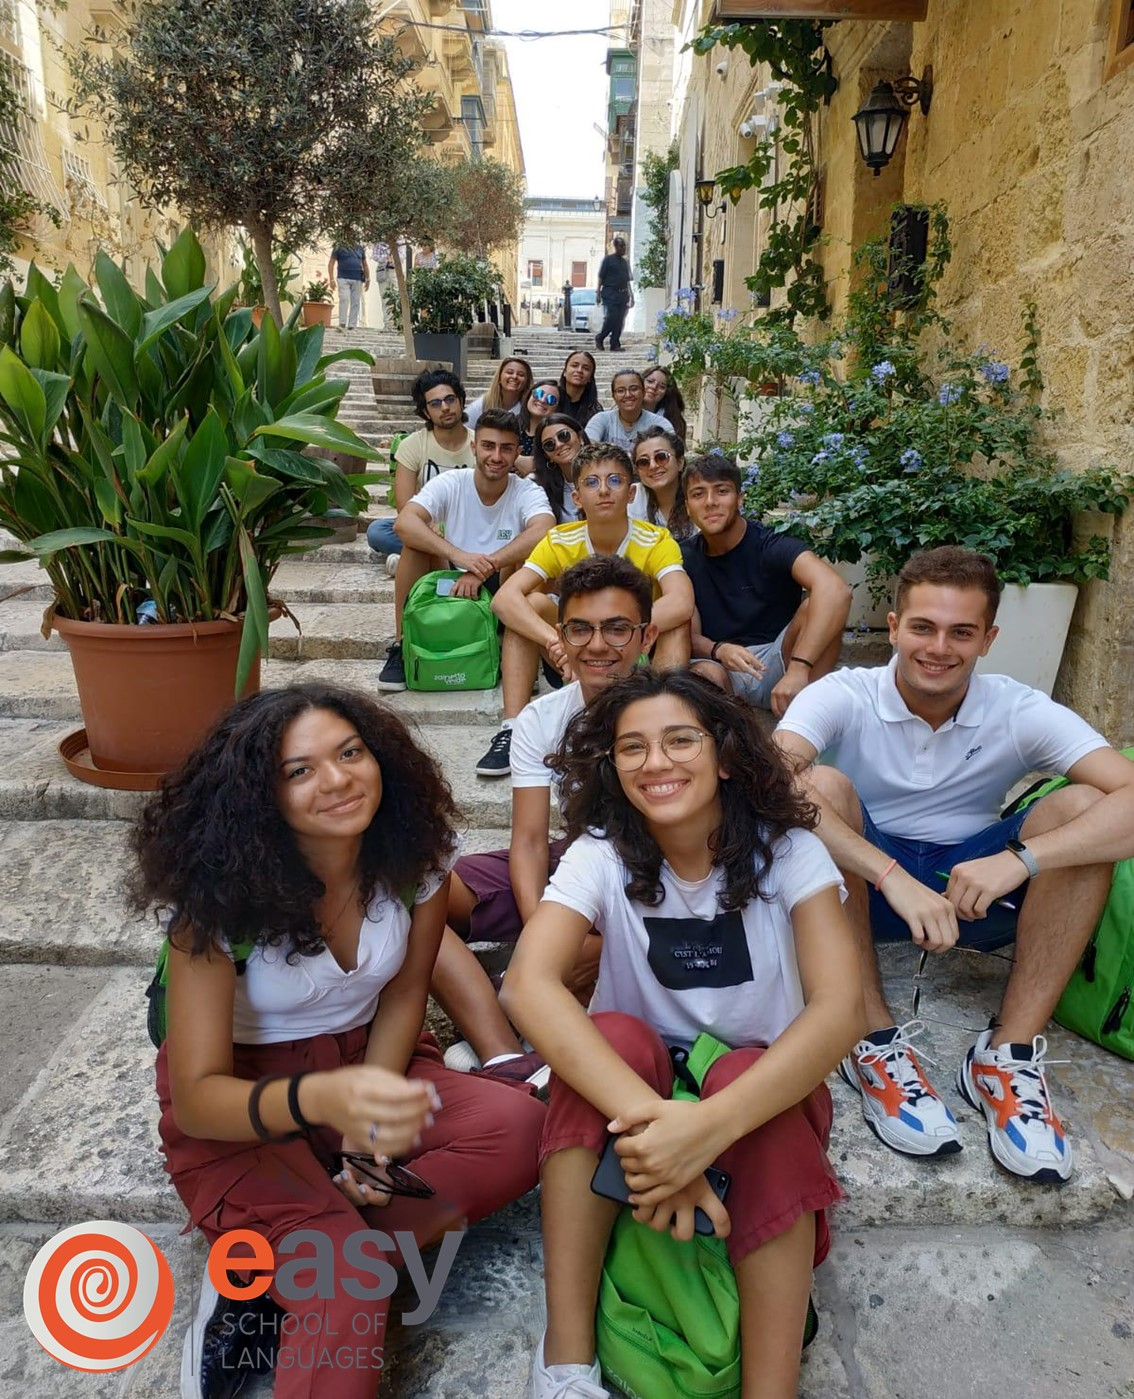 easy school languages malta students